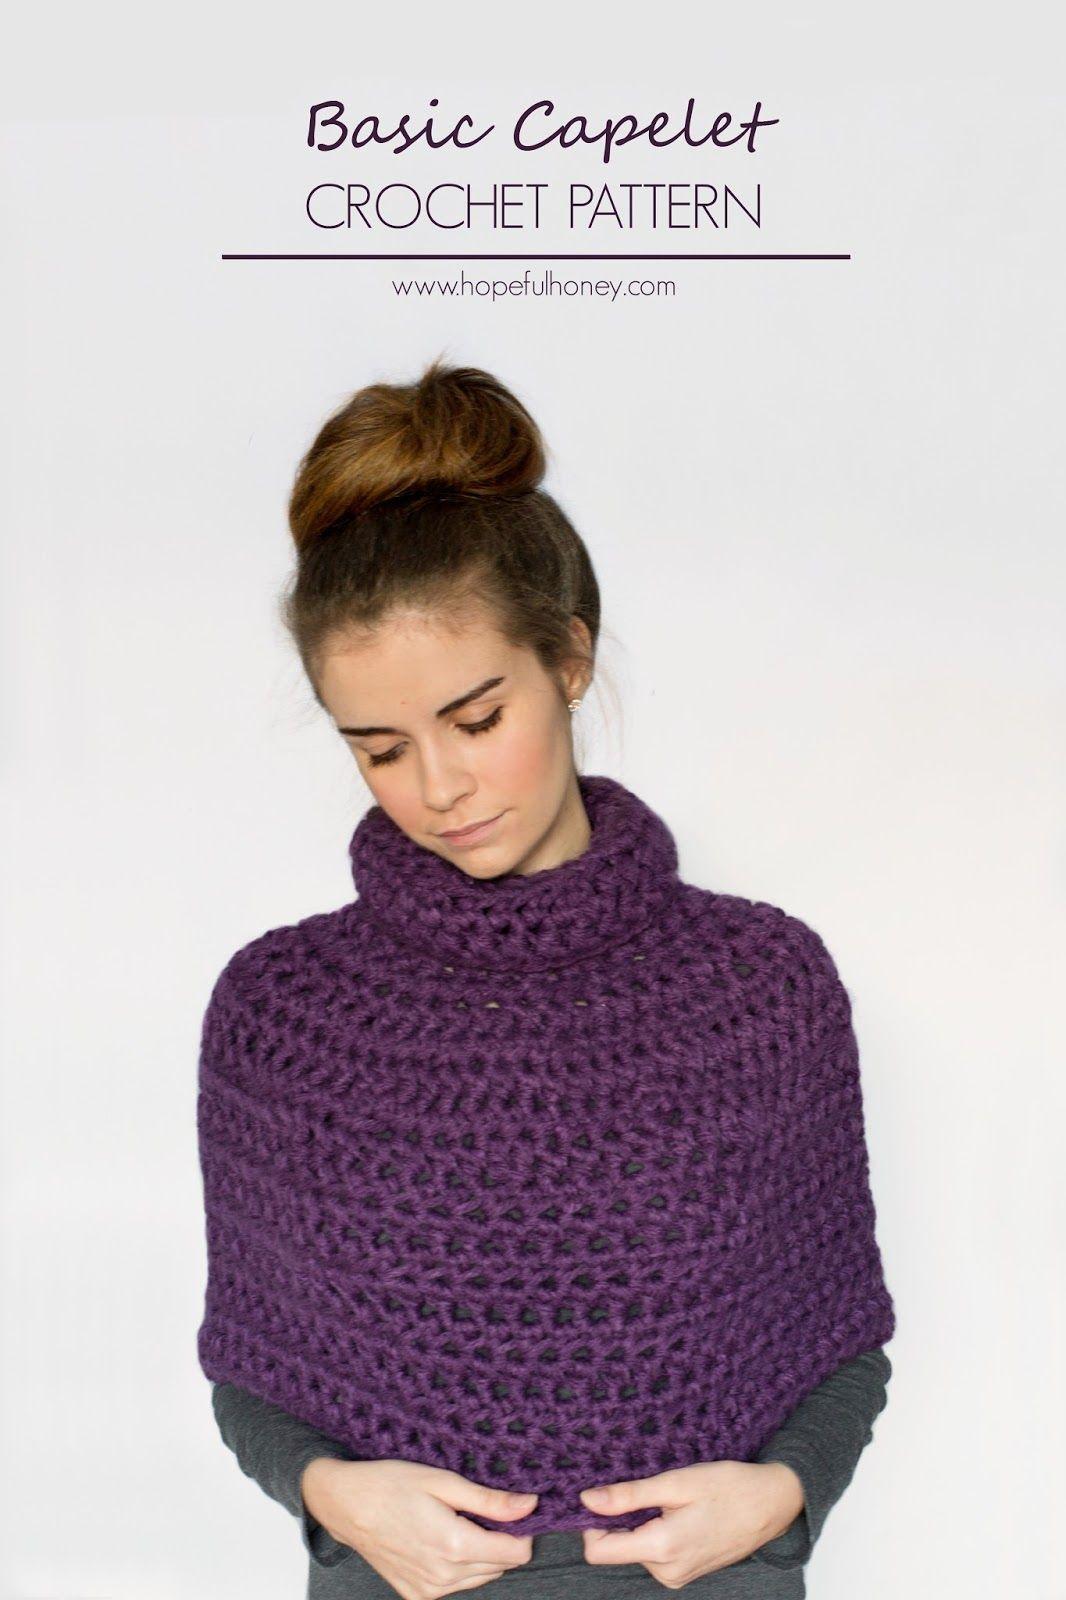 Basic Capelet Crochet Pattern | Capelet, Free crochet and Hopeful honey